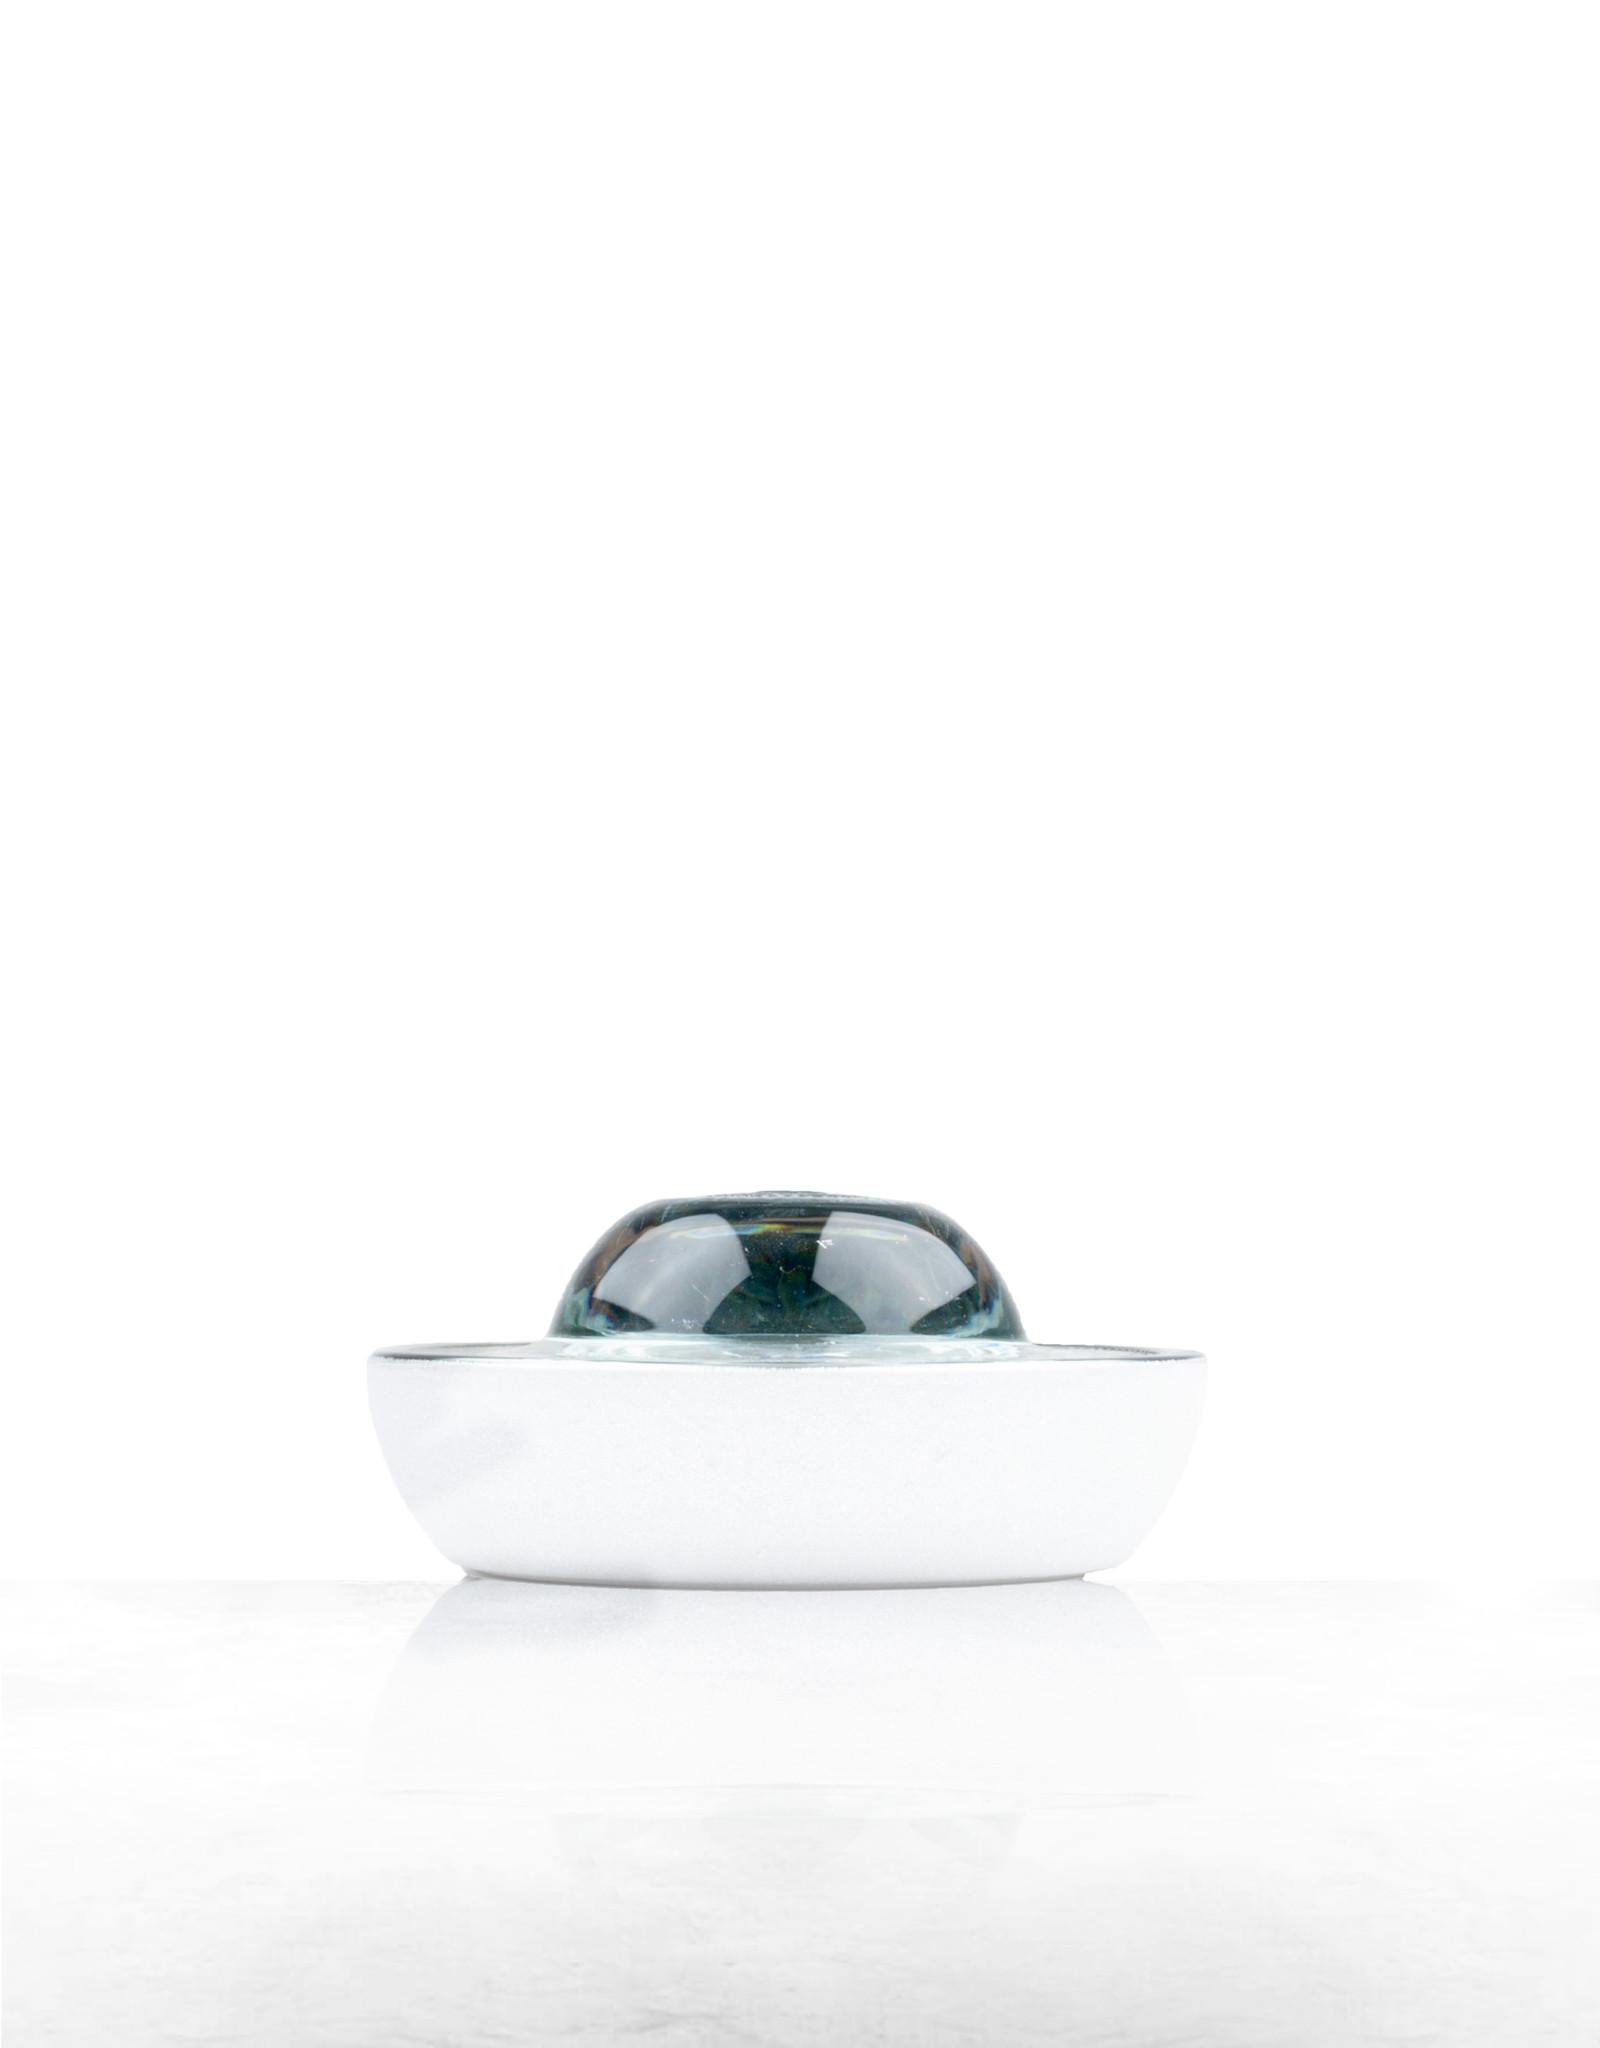 LUX | Glasbolreflector LUX3 Premium Wegdekreflector